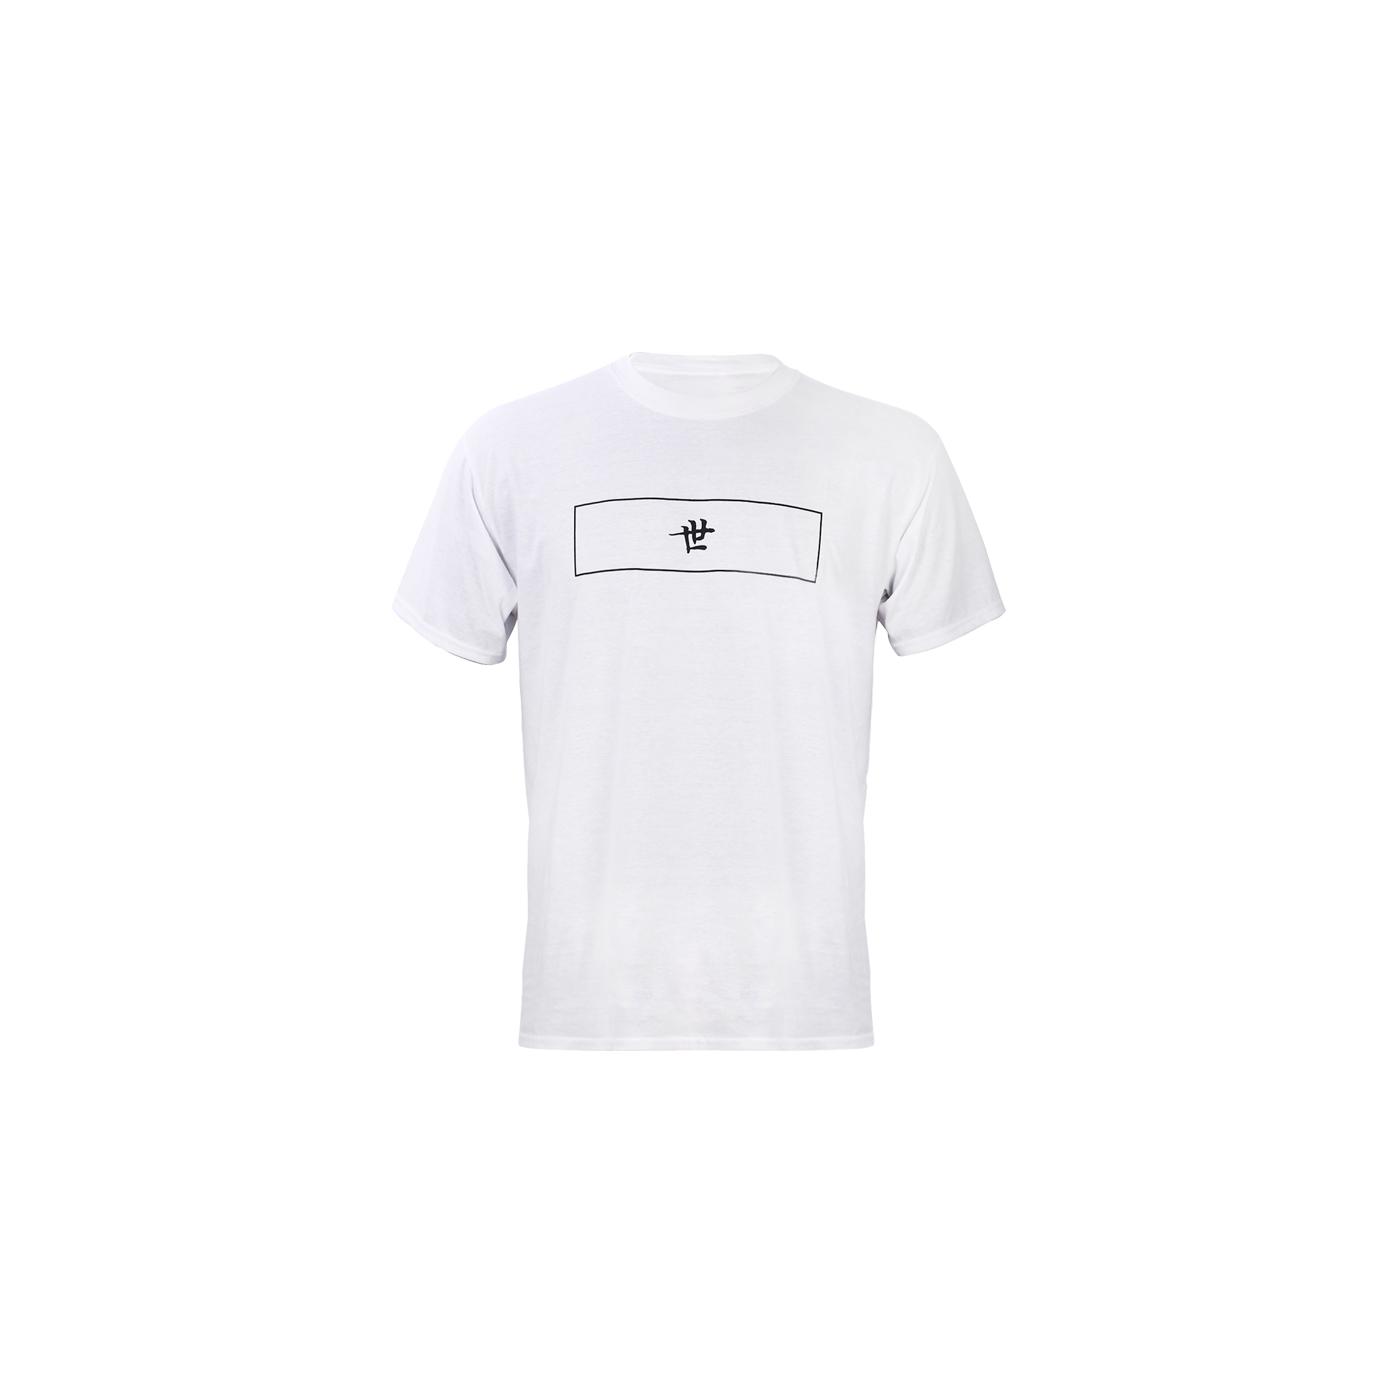 Chinese T-shirt ScanMe3.jpg